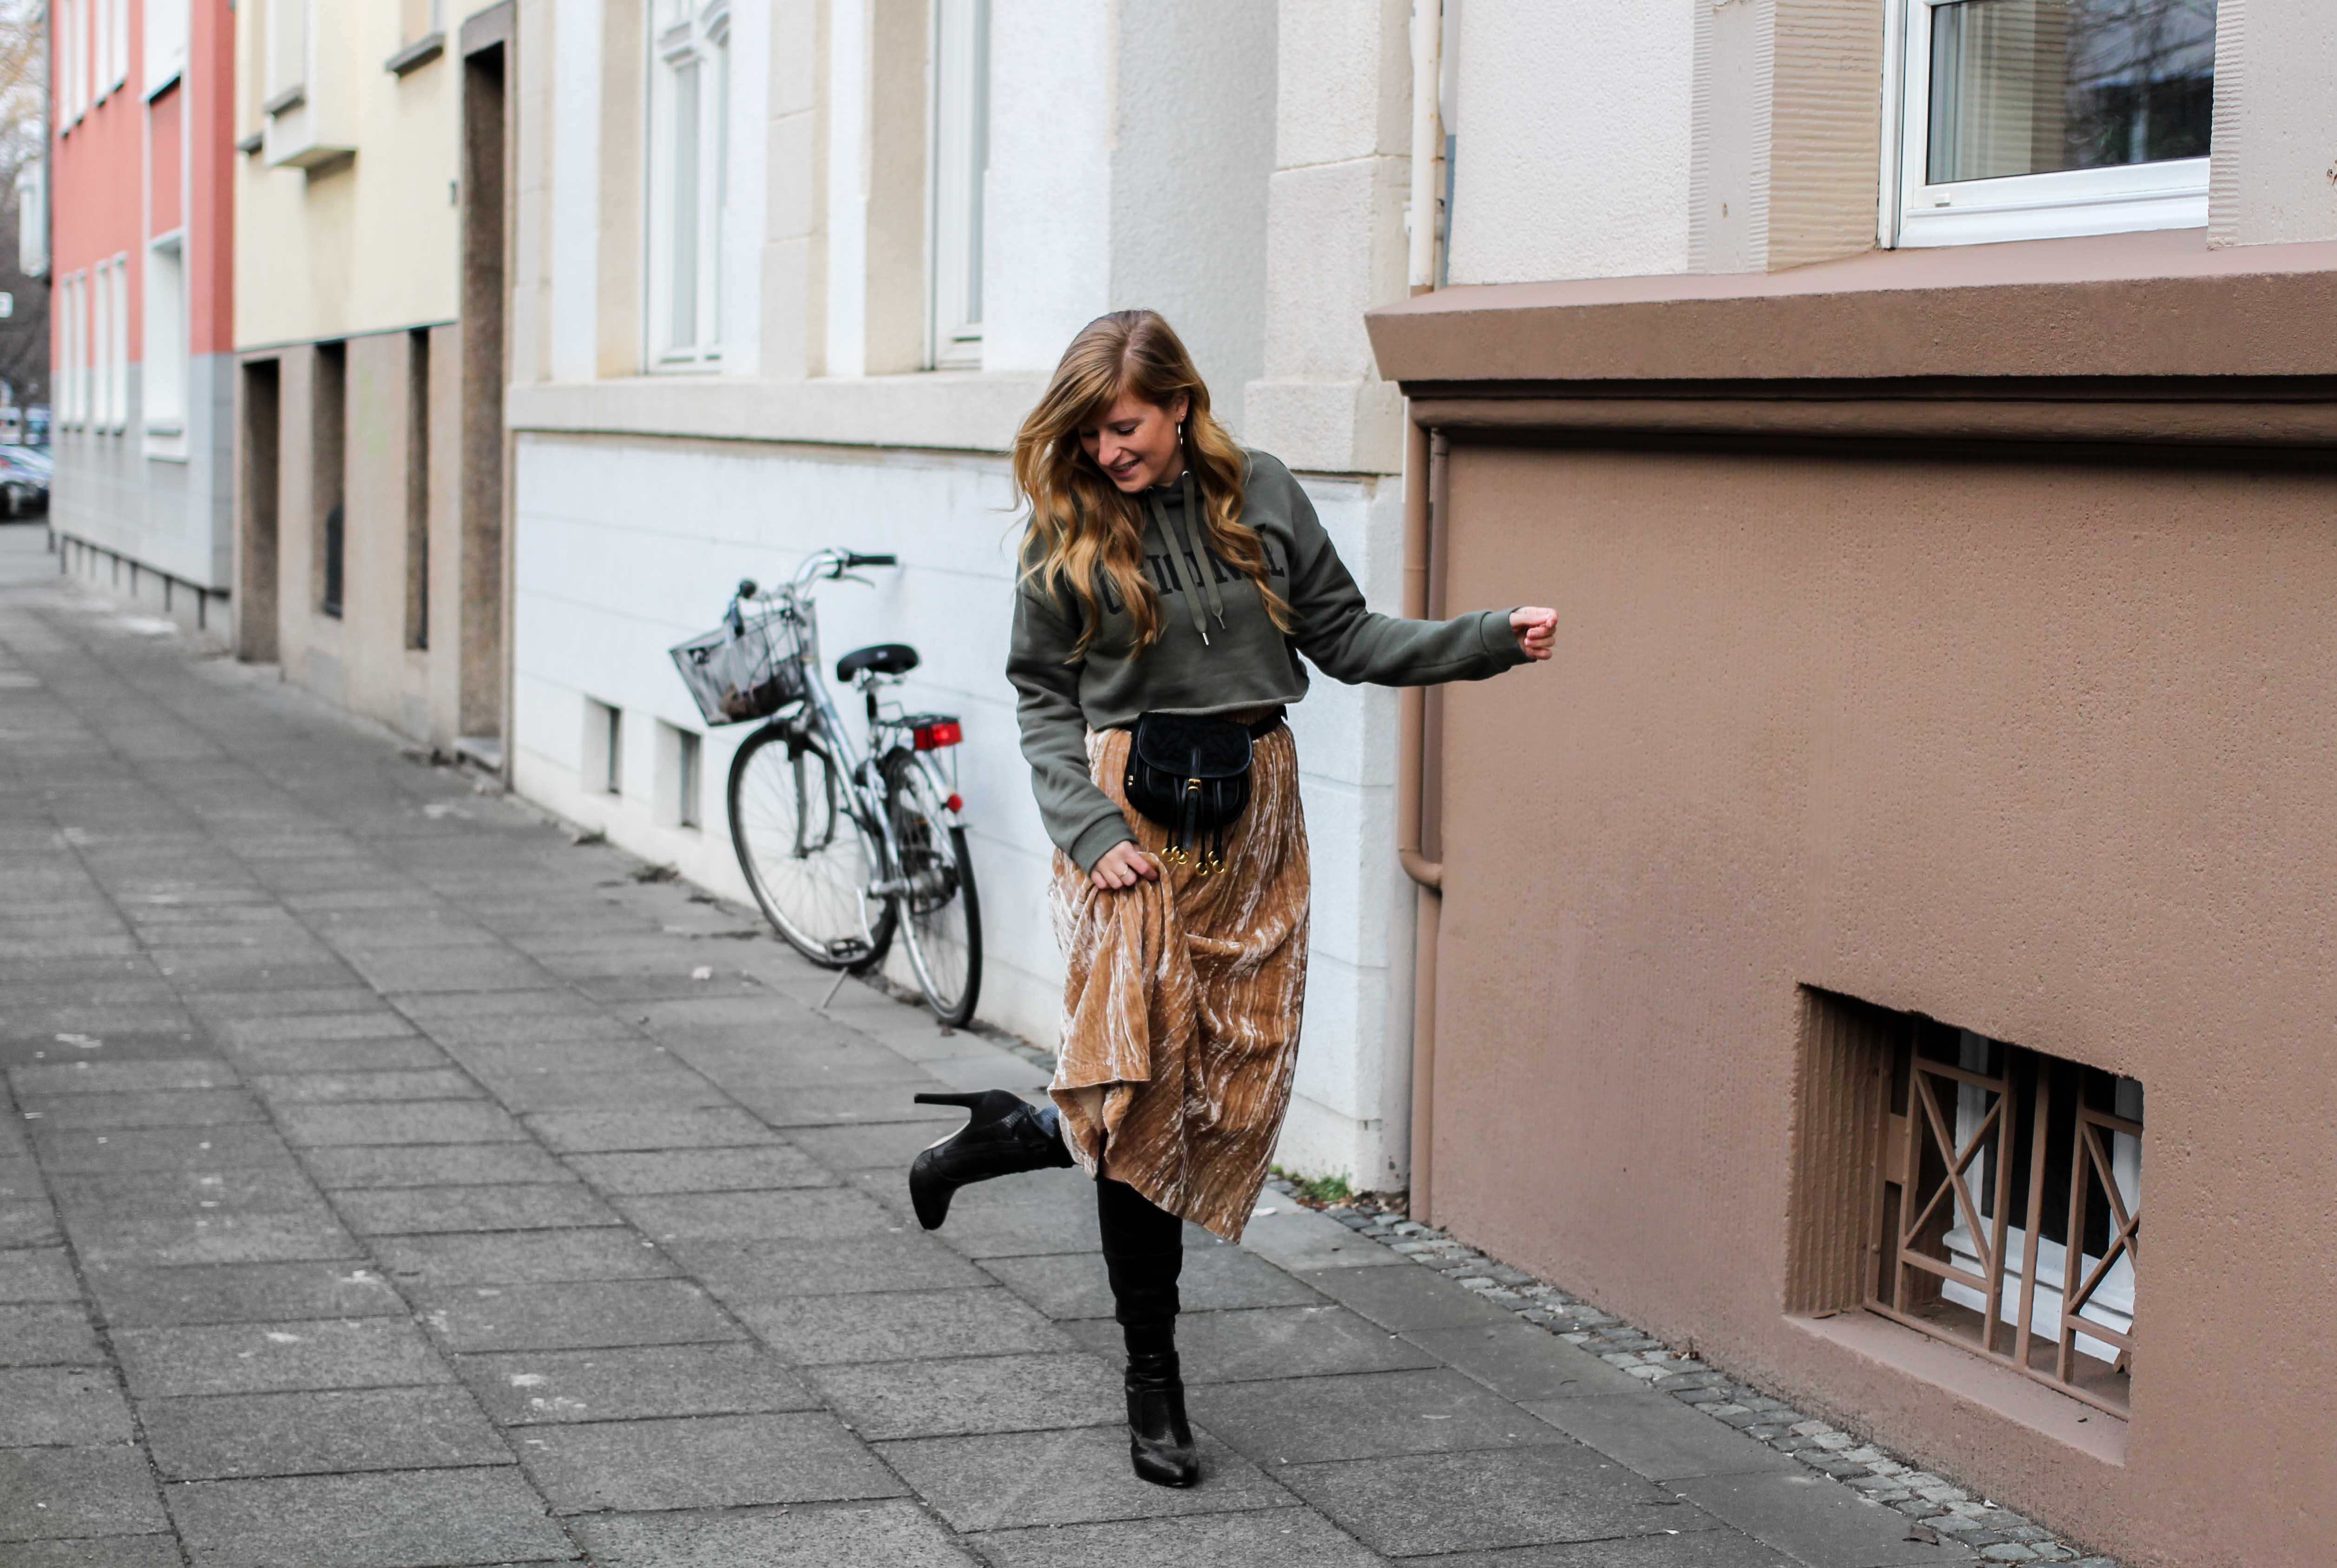 Trendtasche 2019 Gürteltasche kombiniern Gürteltasche Prada Streetstyle Outfit Bonn Frühling Look Crop Pullover 9